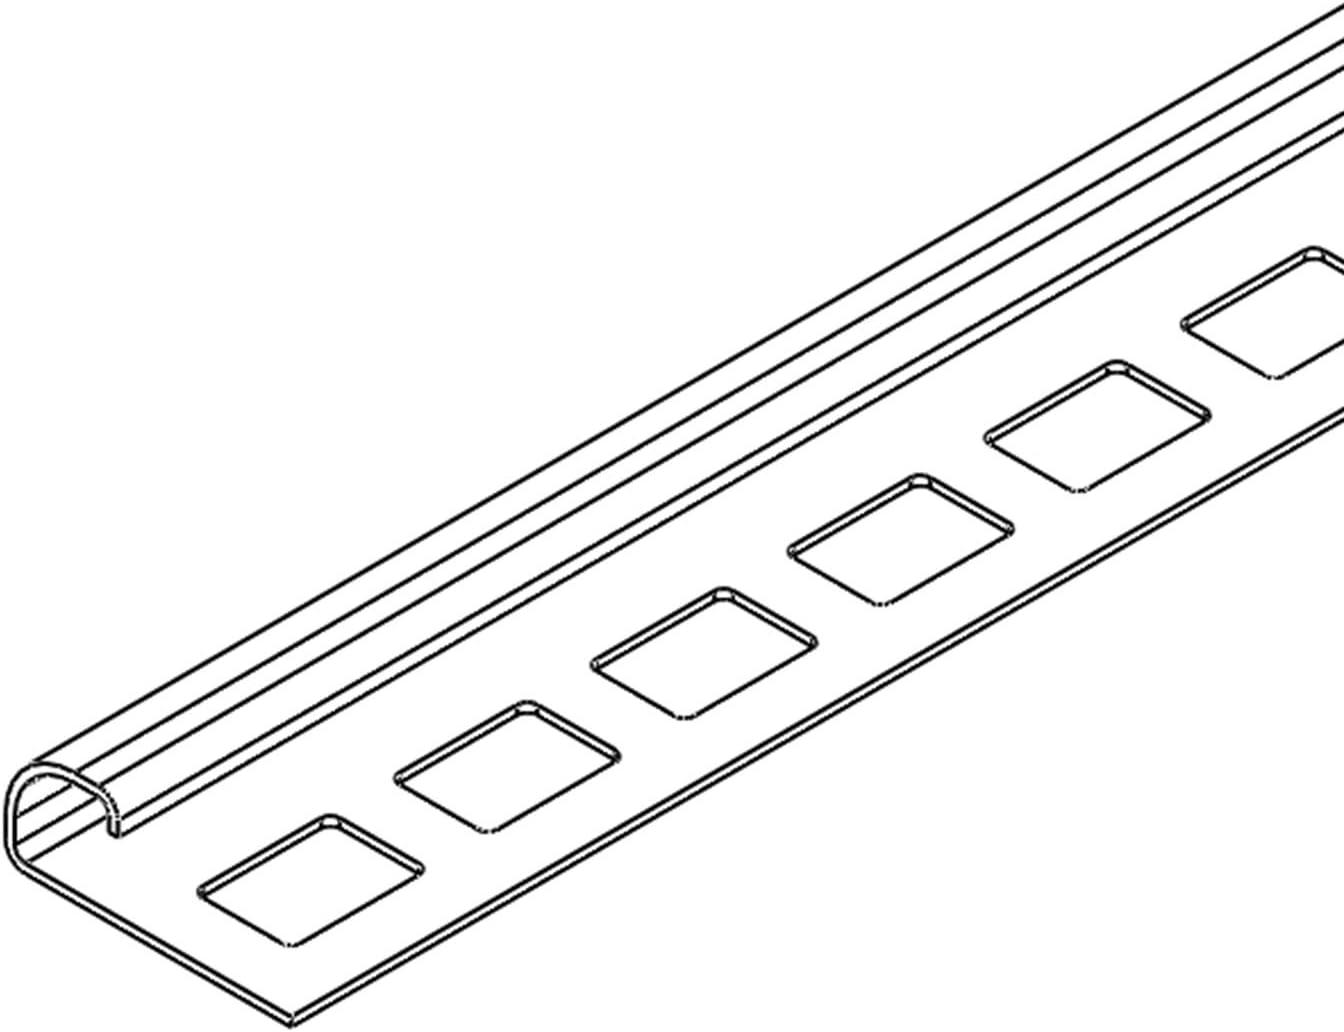 HORI Fliesenprofil I L/änge 2,50 m I Au/ßenecke rund I H/öhe 11 mm I Edelstahl massiv geb/ürstet